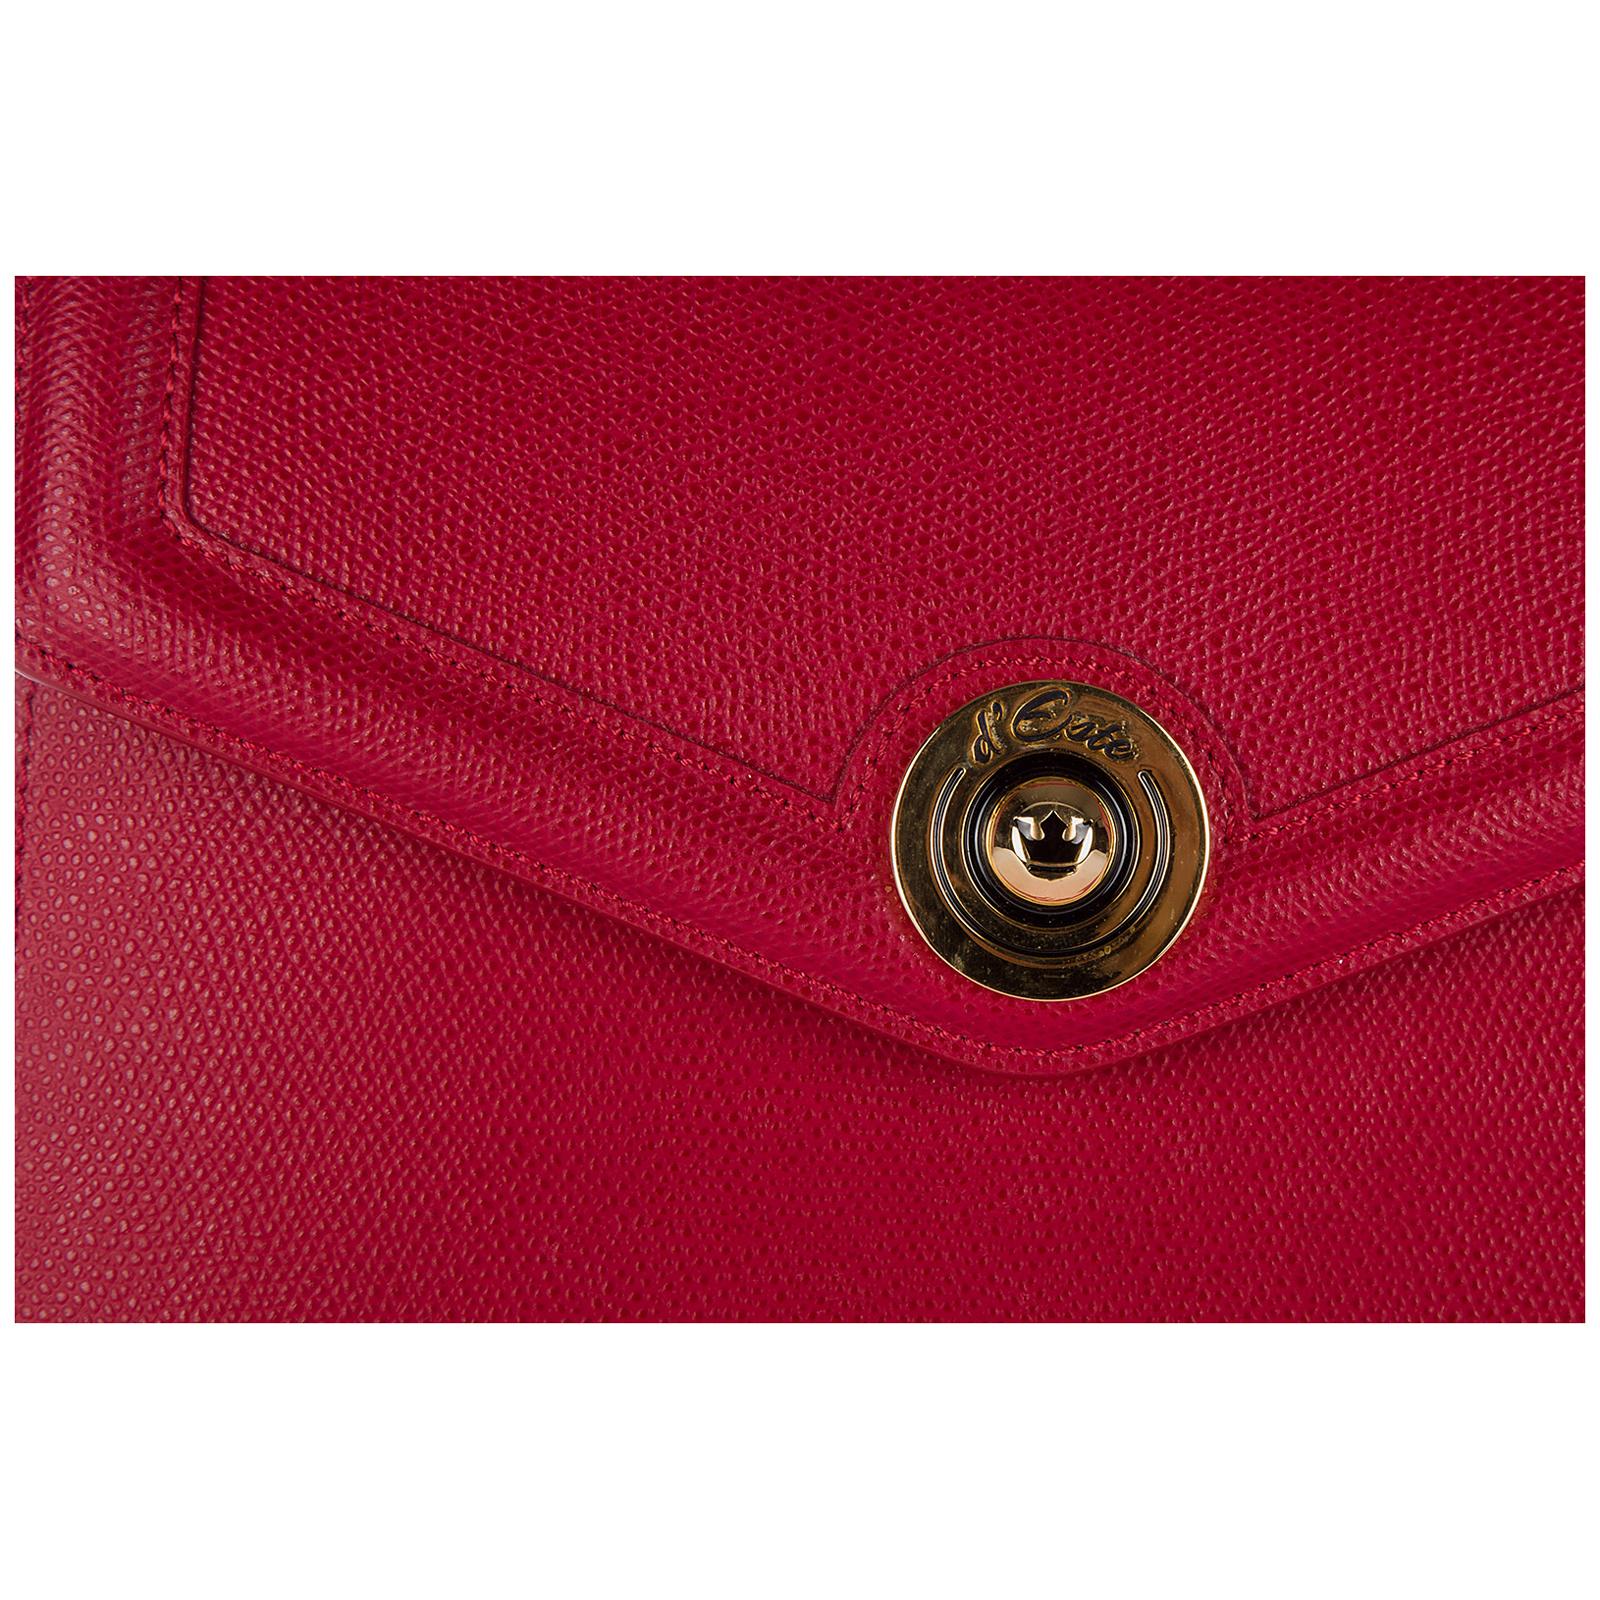 Women's leather handbag shopping bag purse monaco